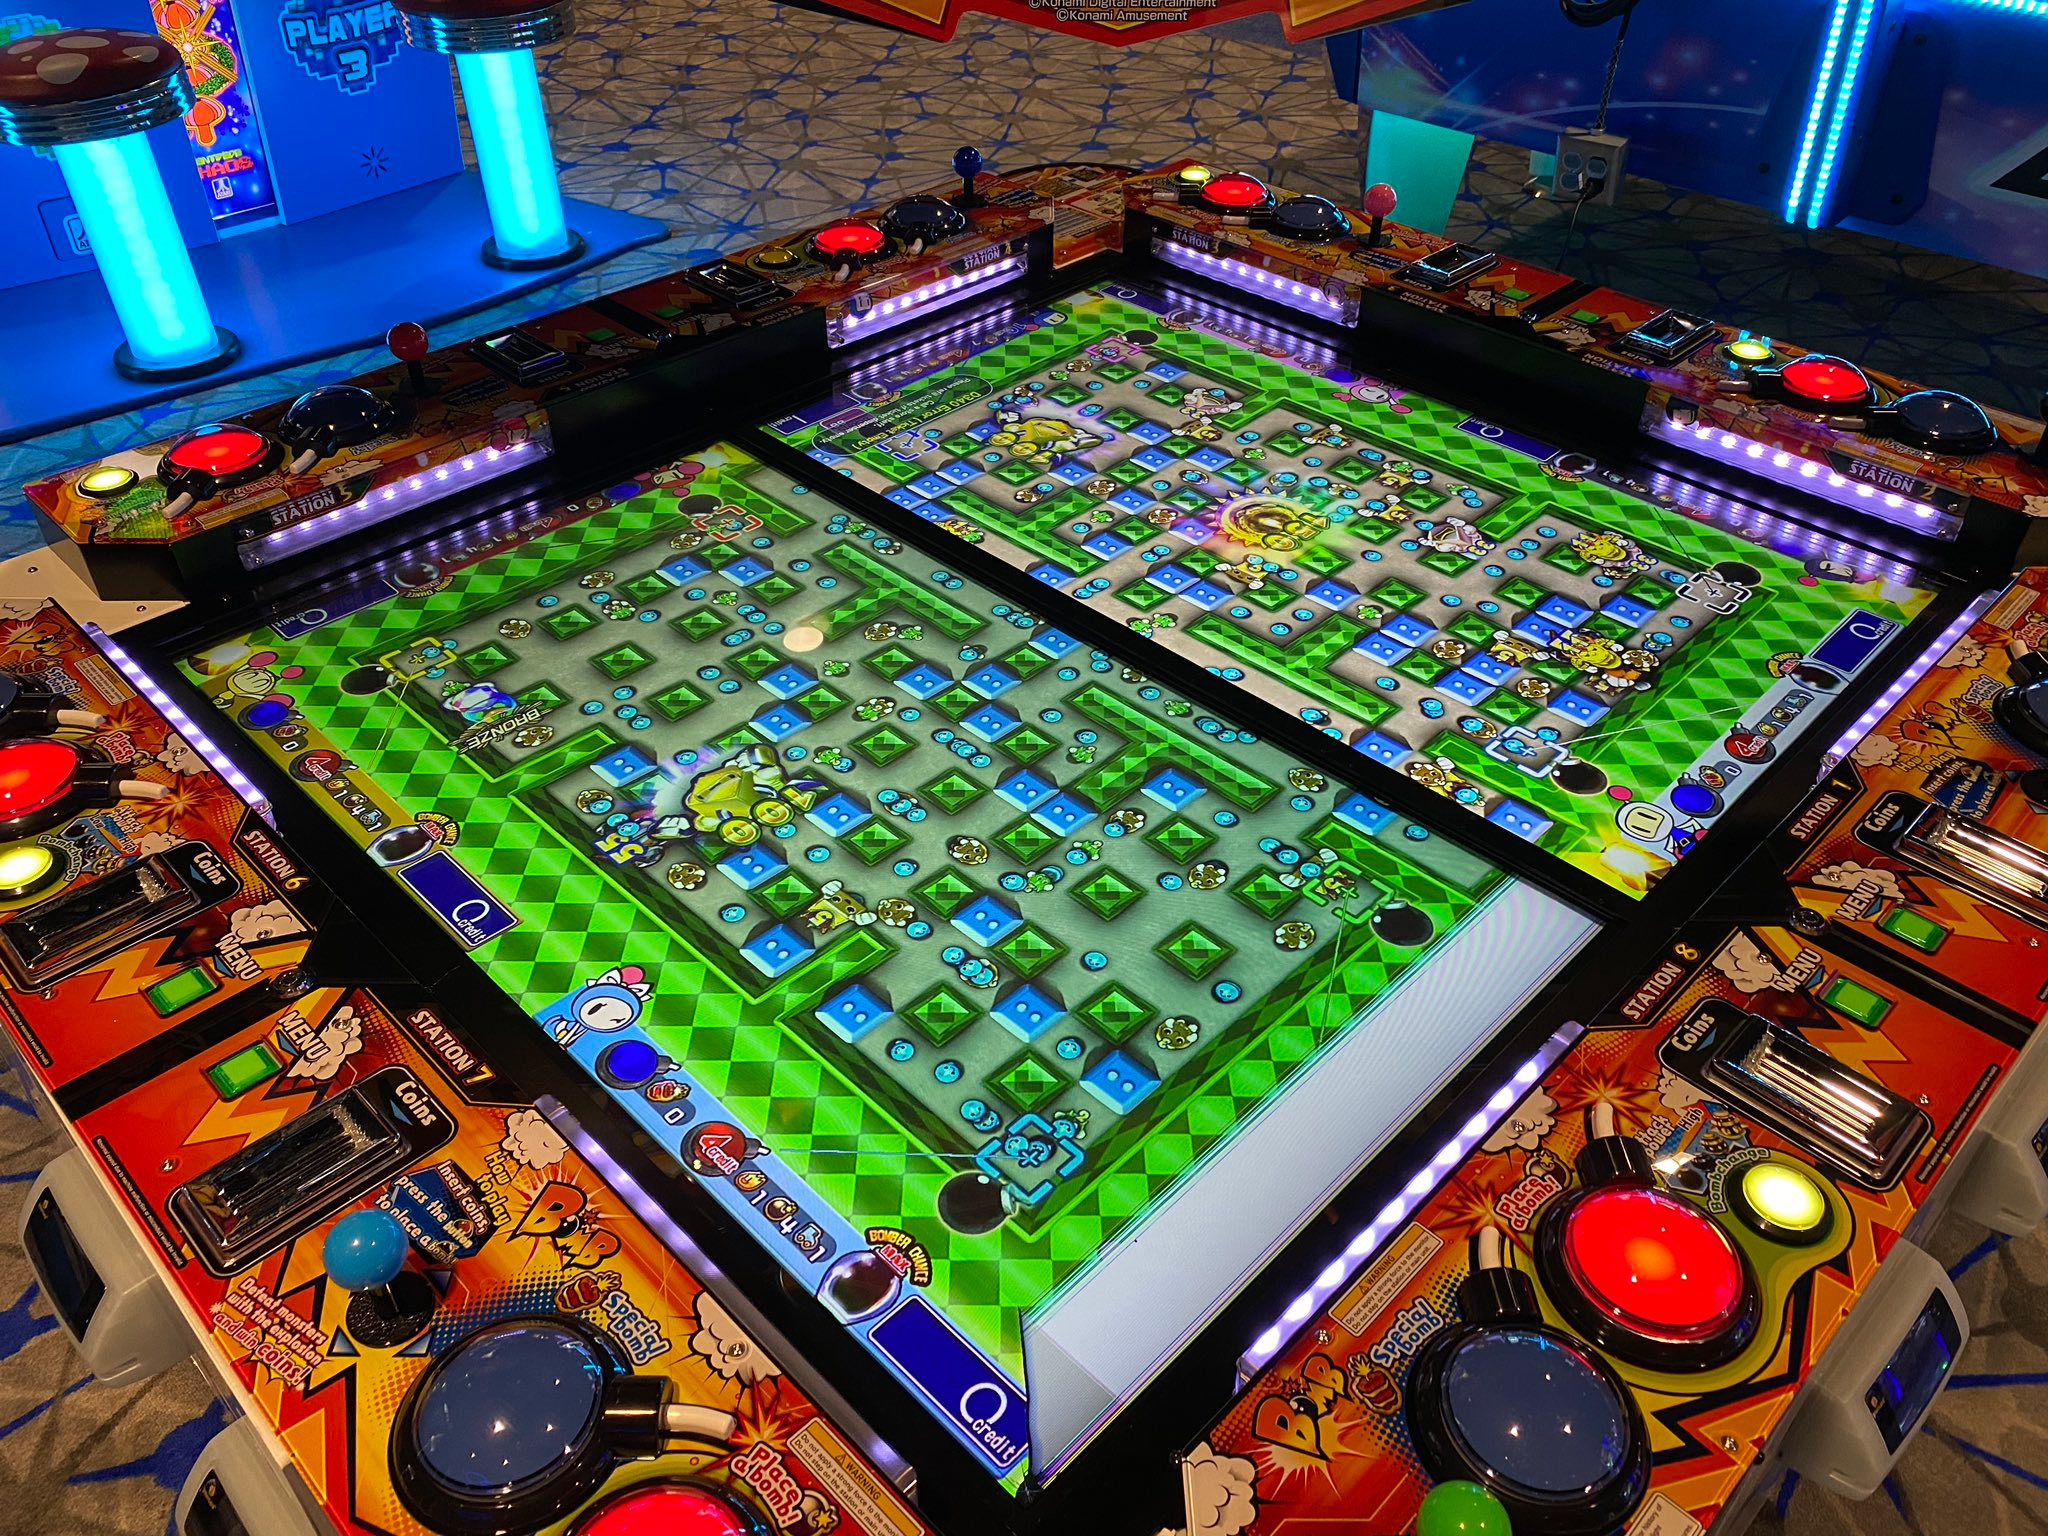 arcadeheroes.com - arcadehero - Newsbytes: New Bomberman; VR Troubles; Talking Survival and More